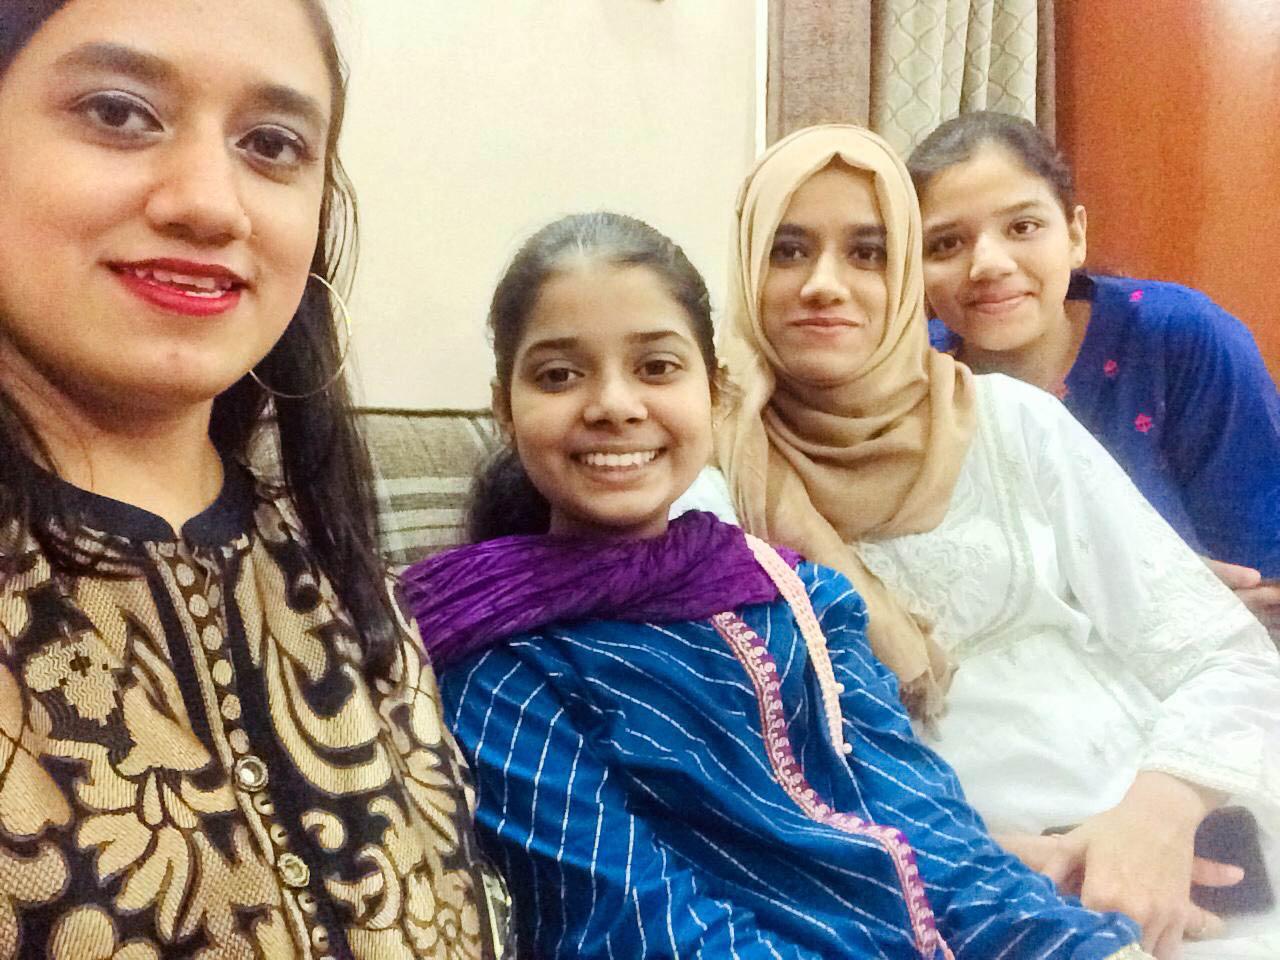 Faryal's sisters, Fatima Khaleeq and Maryam Khaleeq with Zoya and Zara Imran.